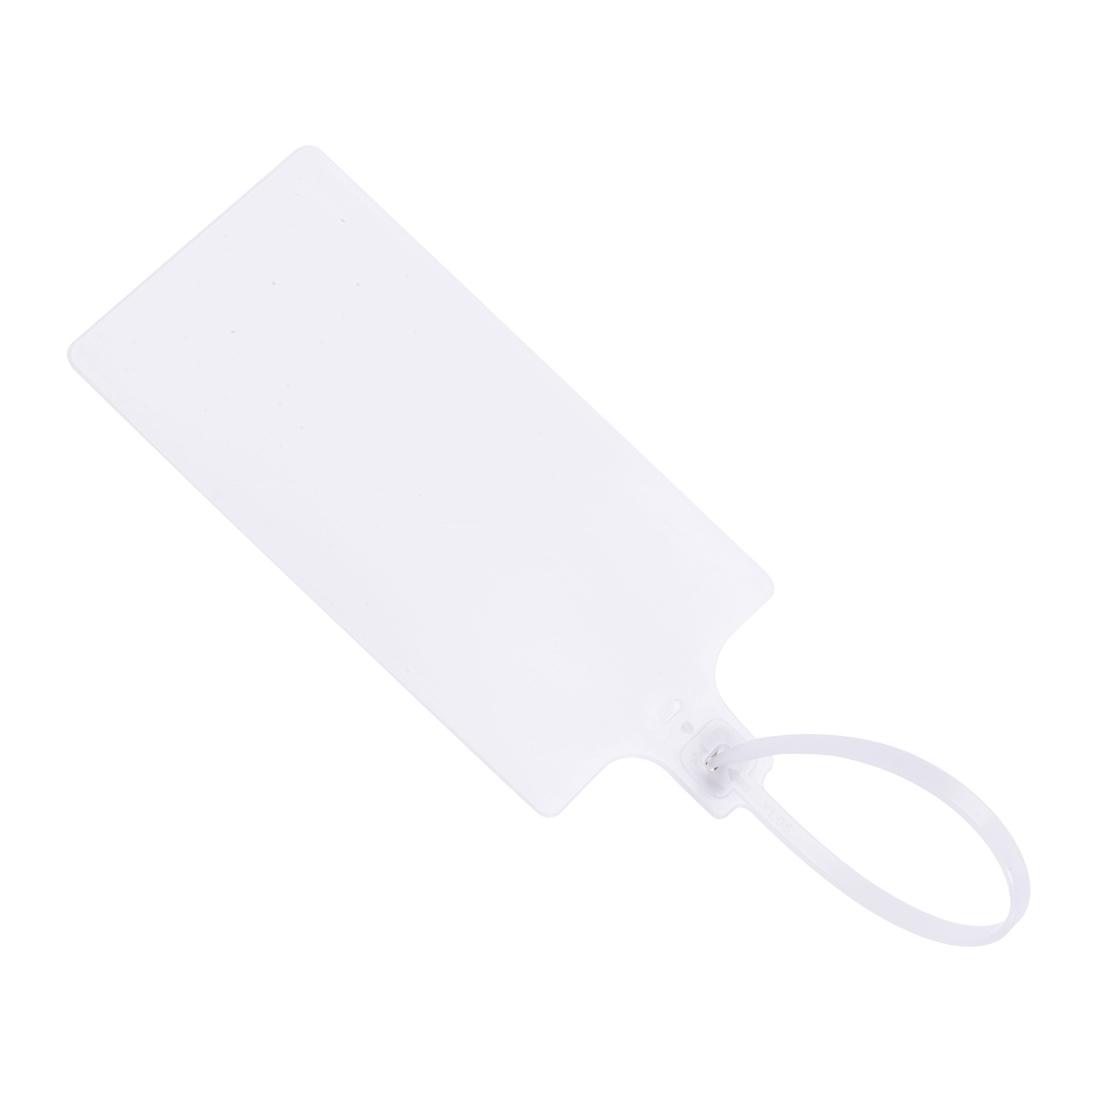 Plastic Zip Ties Seals Anti-Tamper 255mm Length, White, Pack of 20